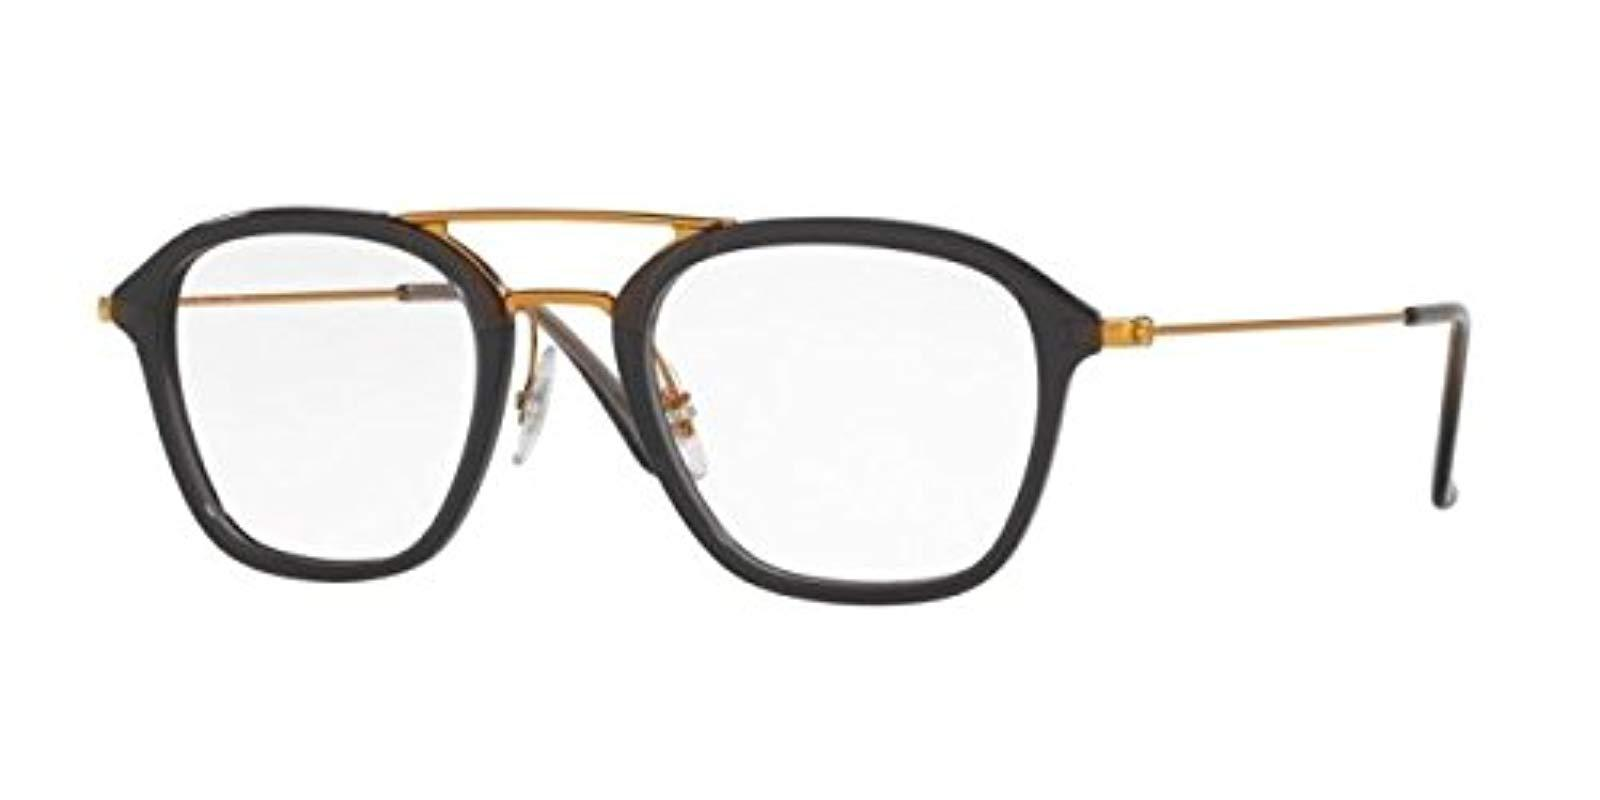 0b011df878d24 Ray-Ban. Women s Gray 0rx 7098 5633 50 Optical Frames ...